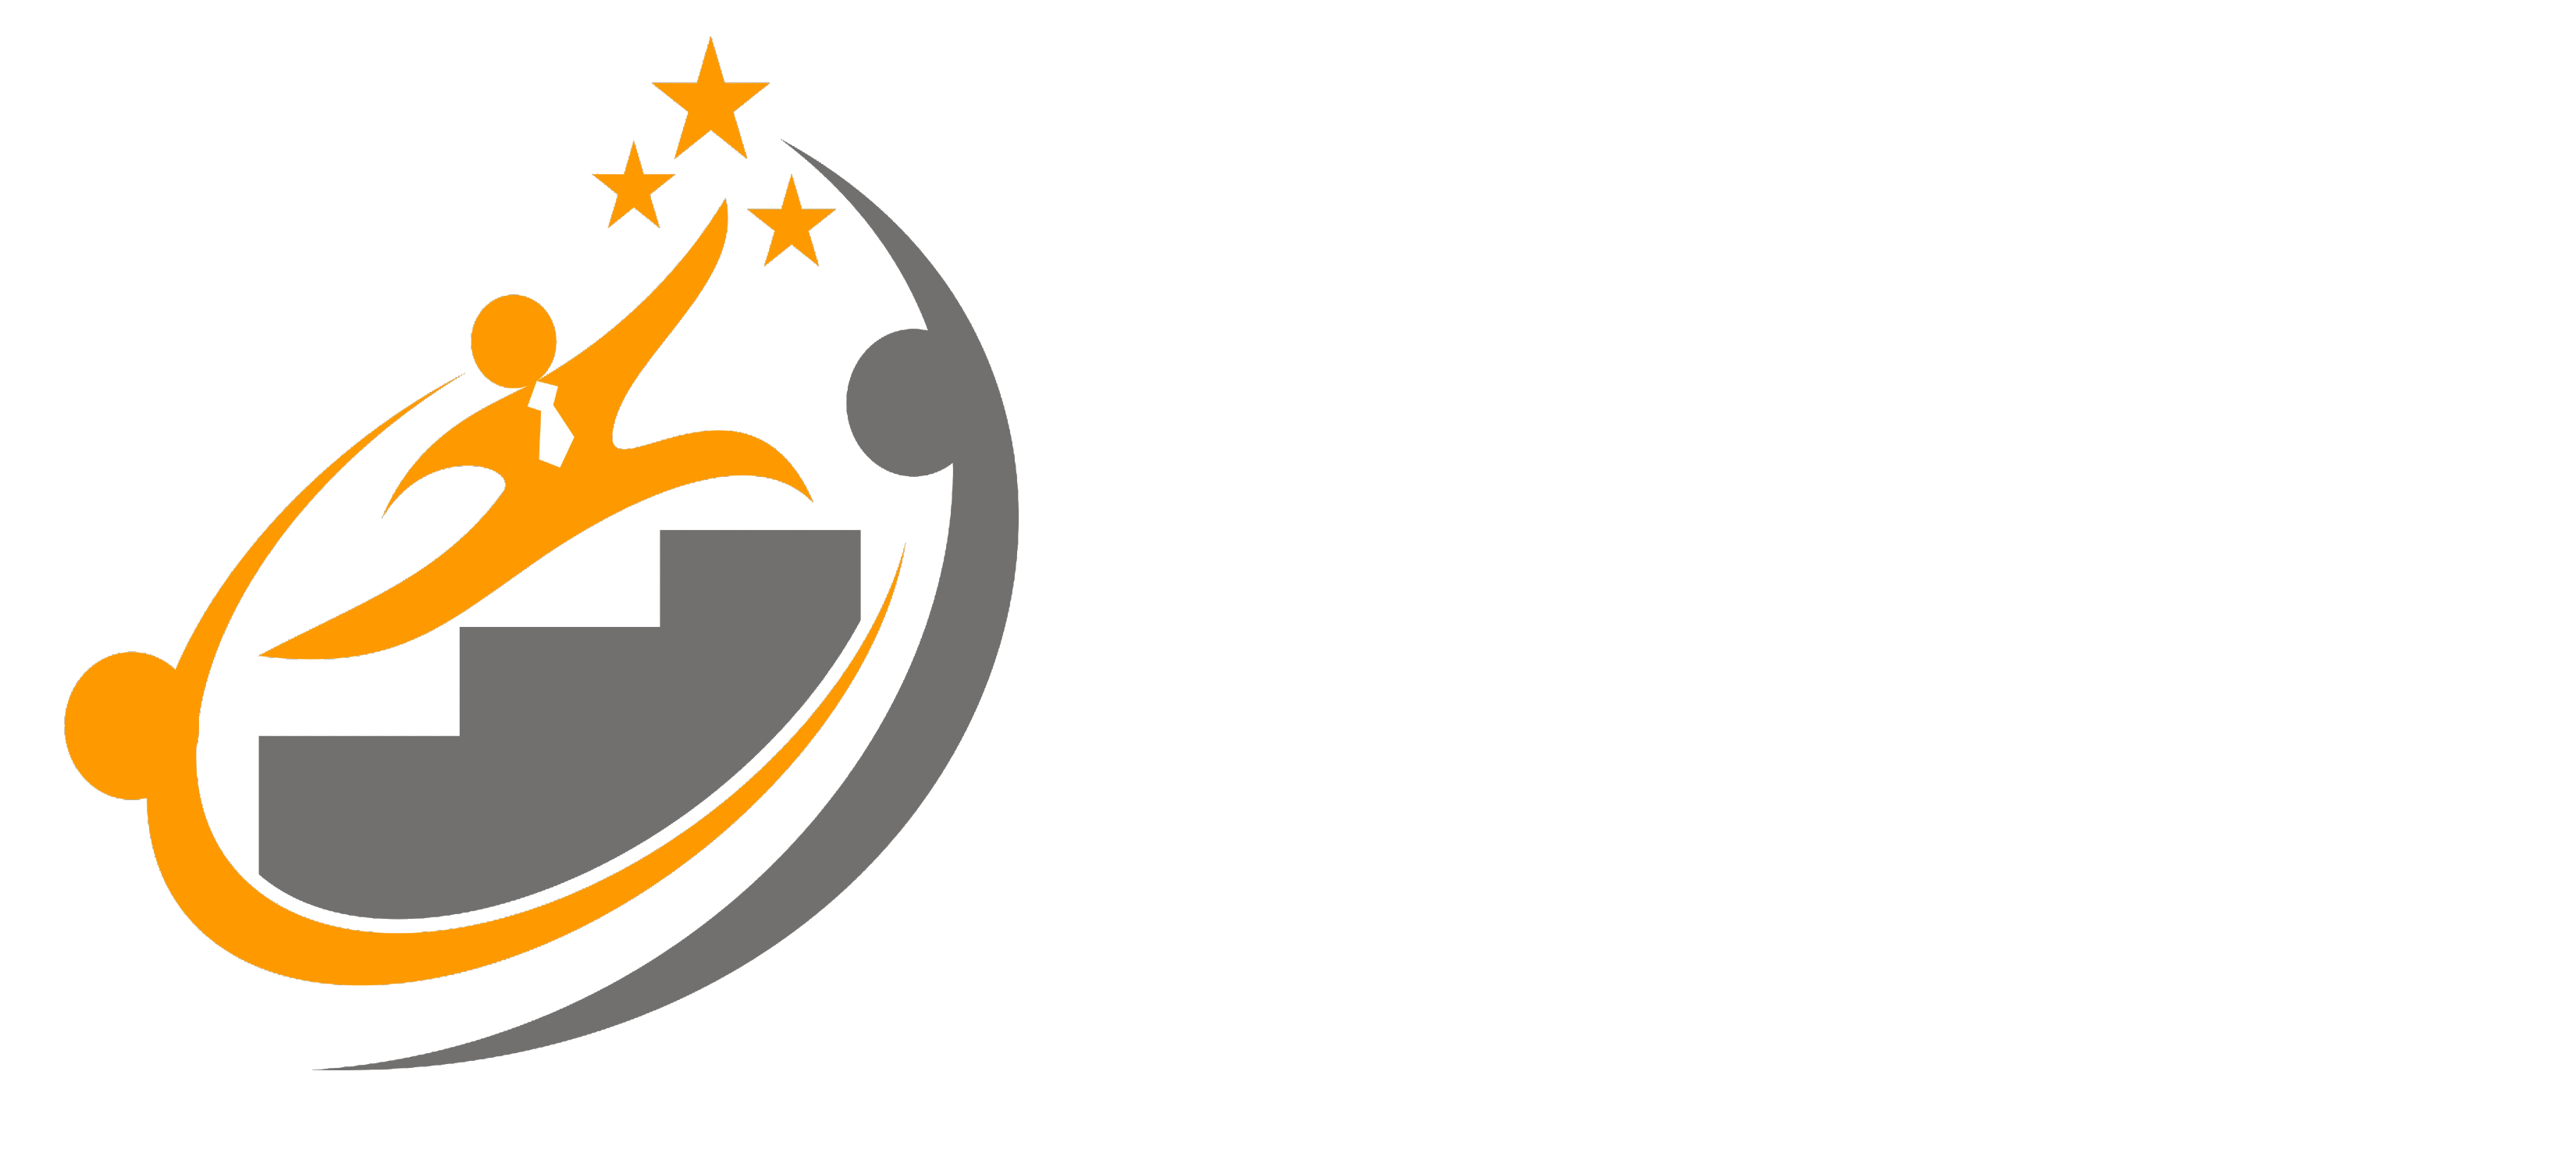 Career Assistance